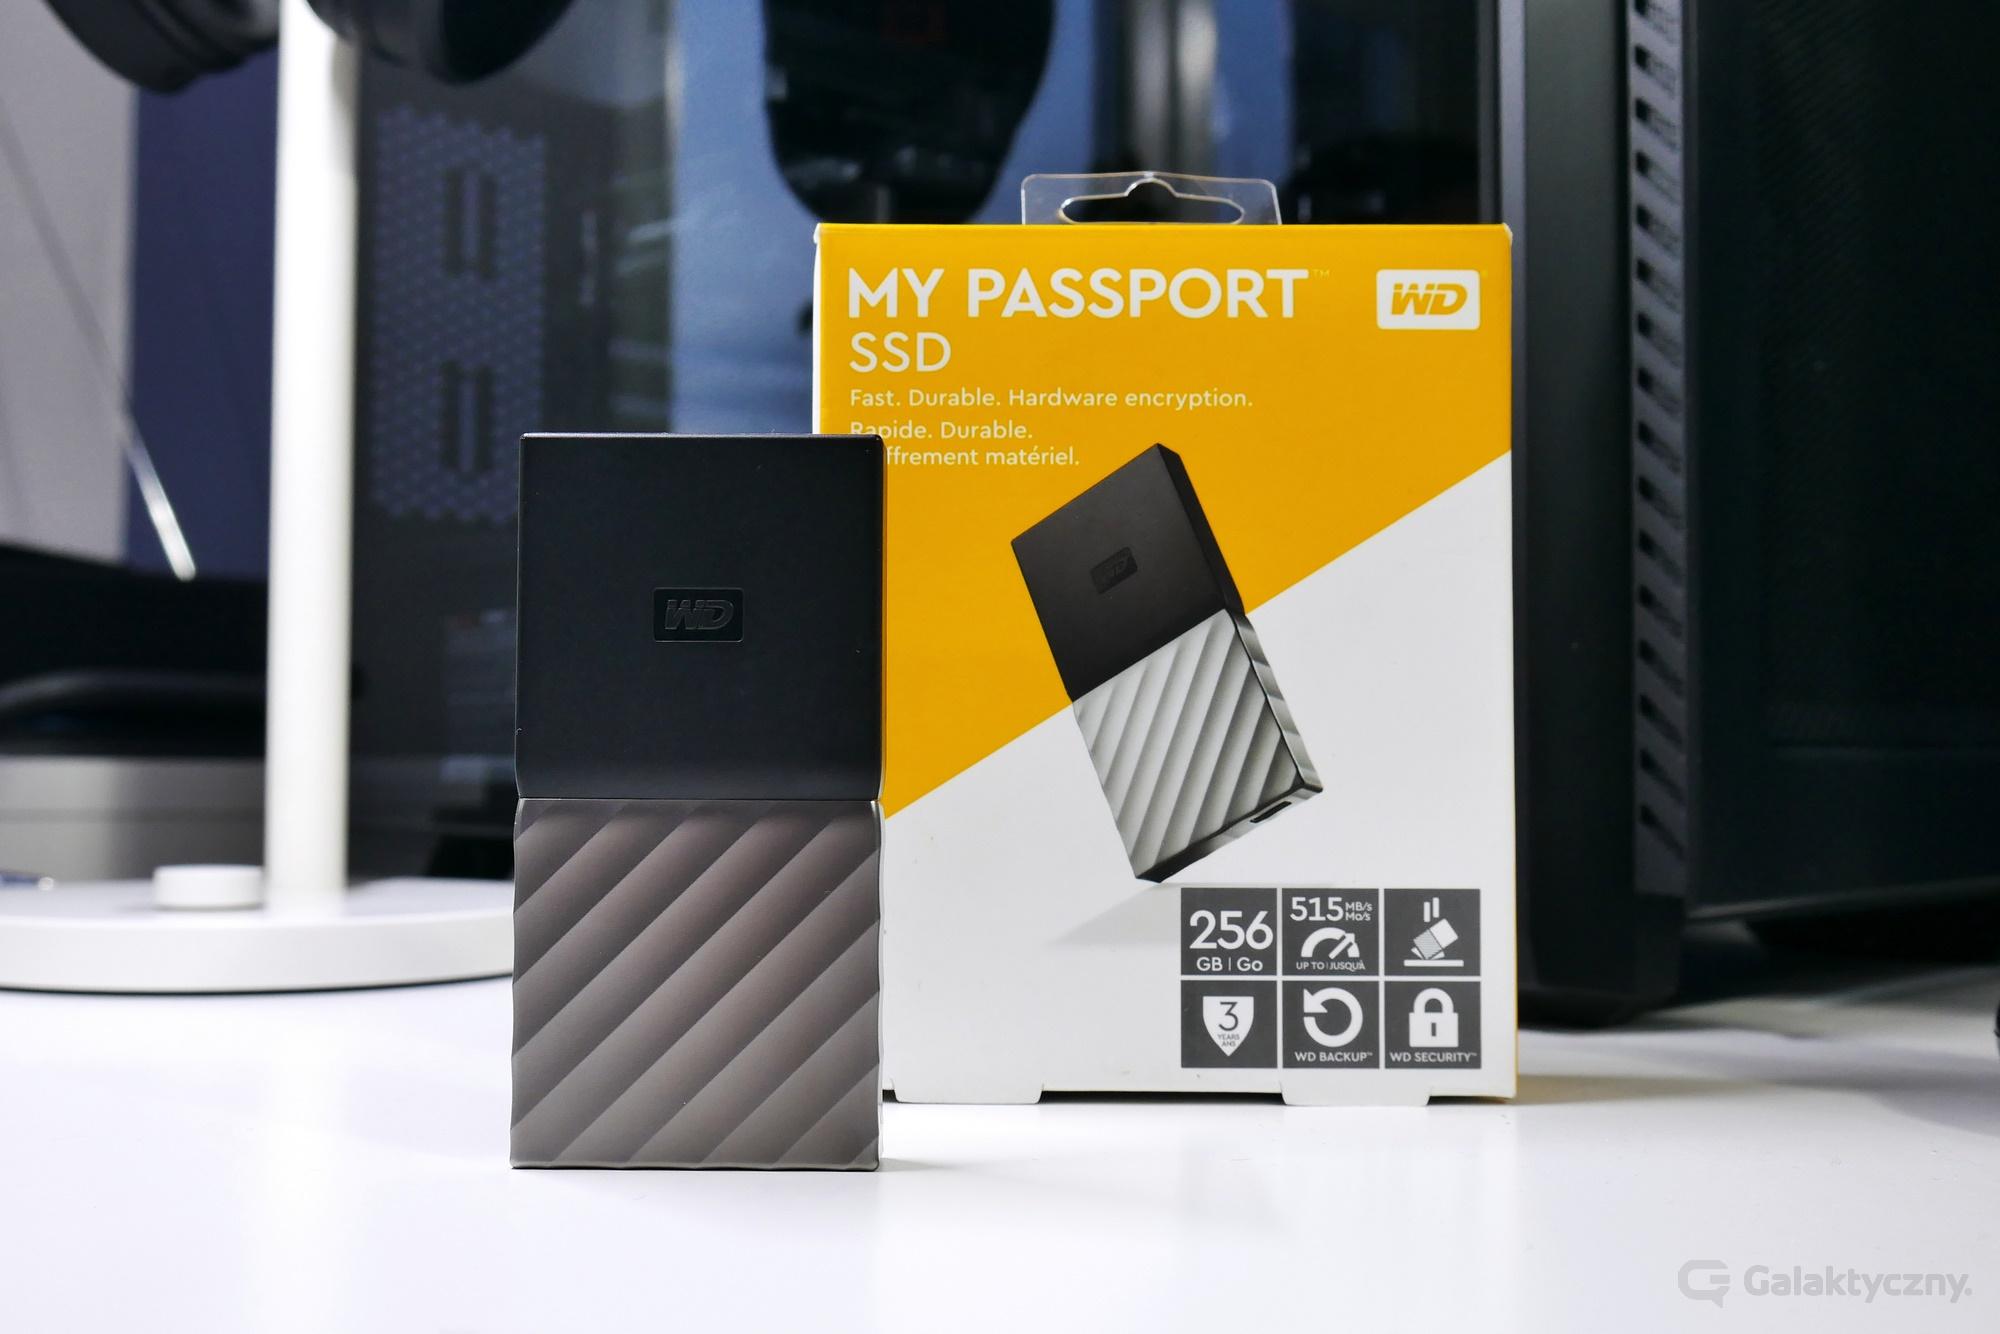 WD My Passport SSD 256 GB